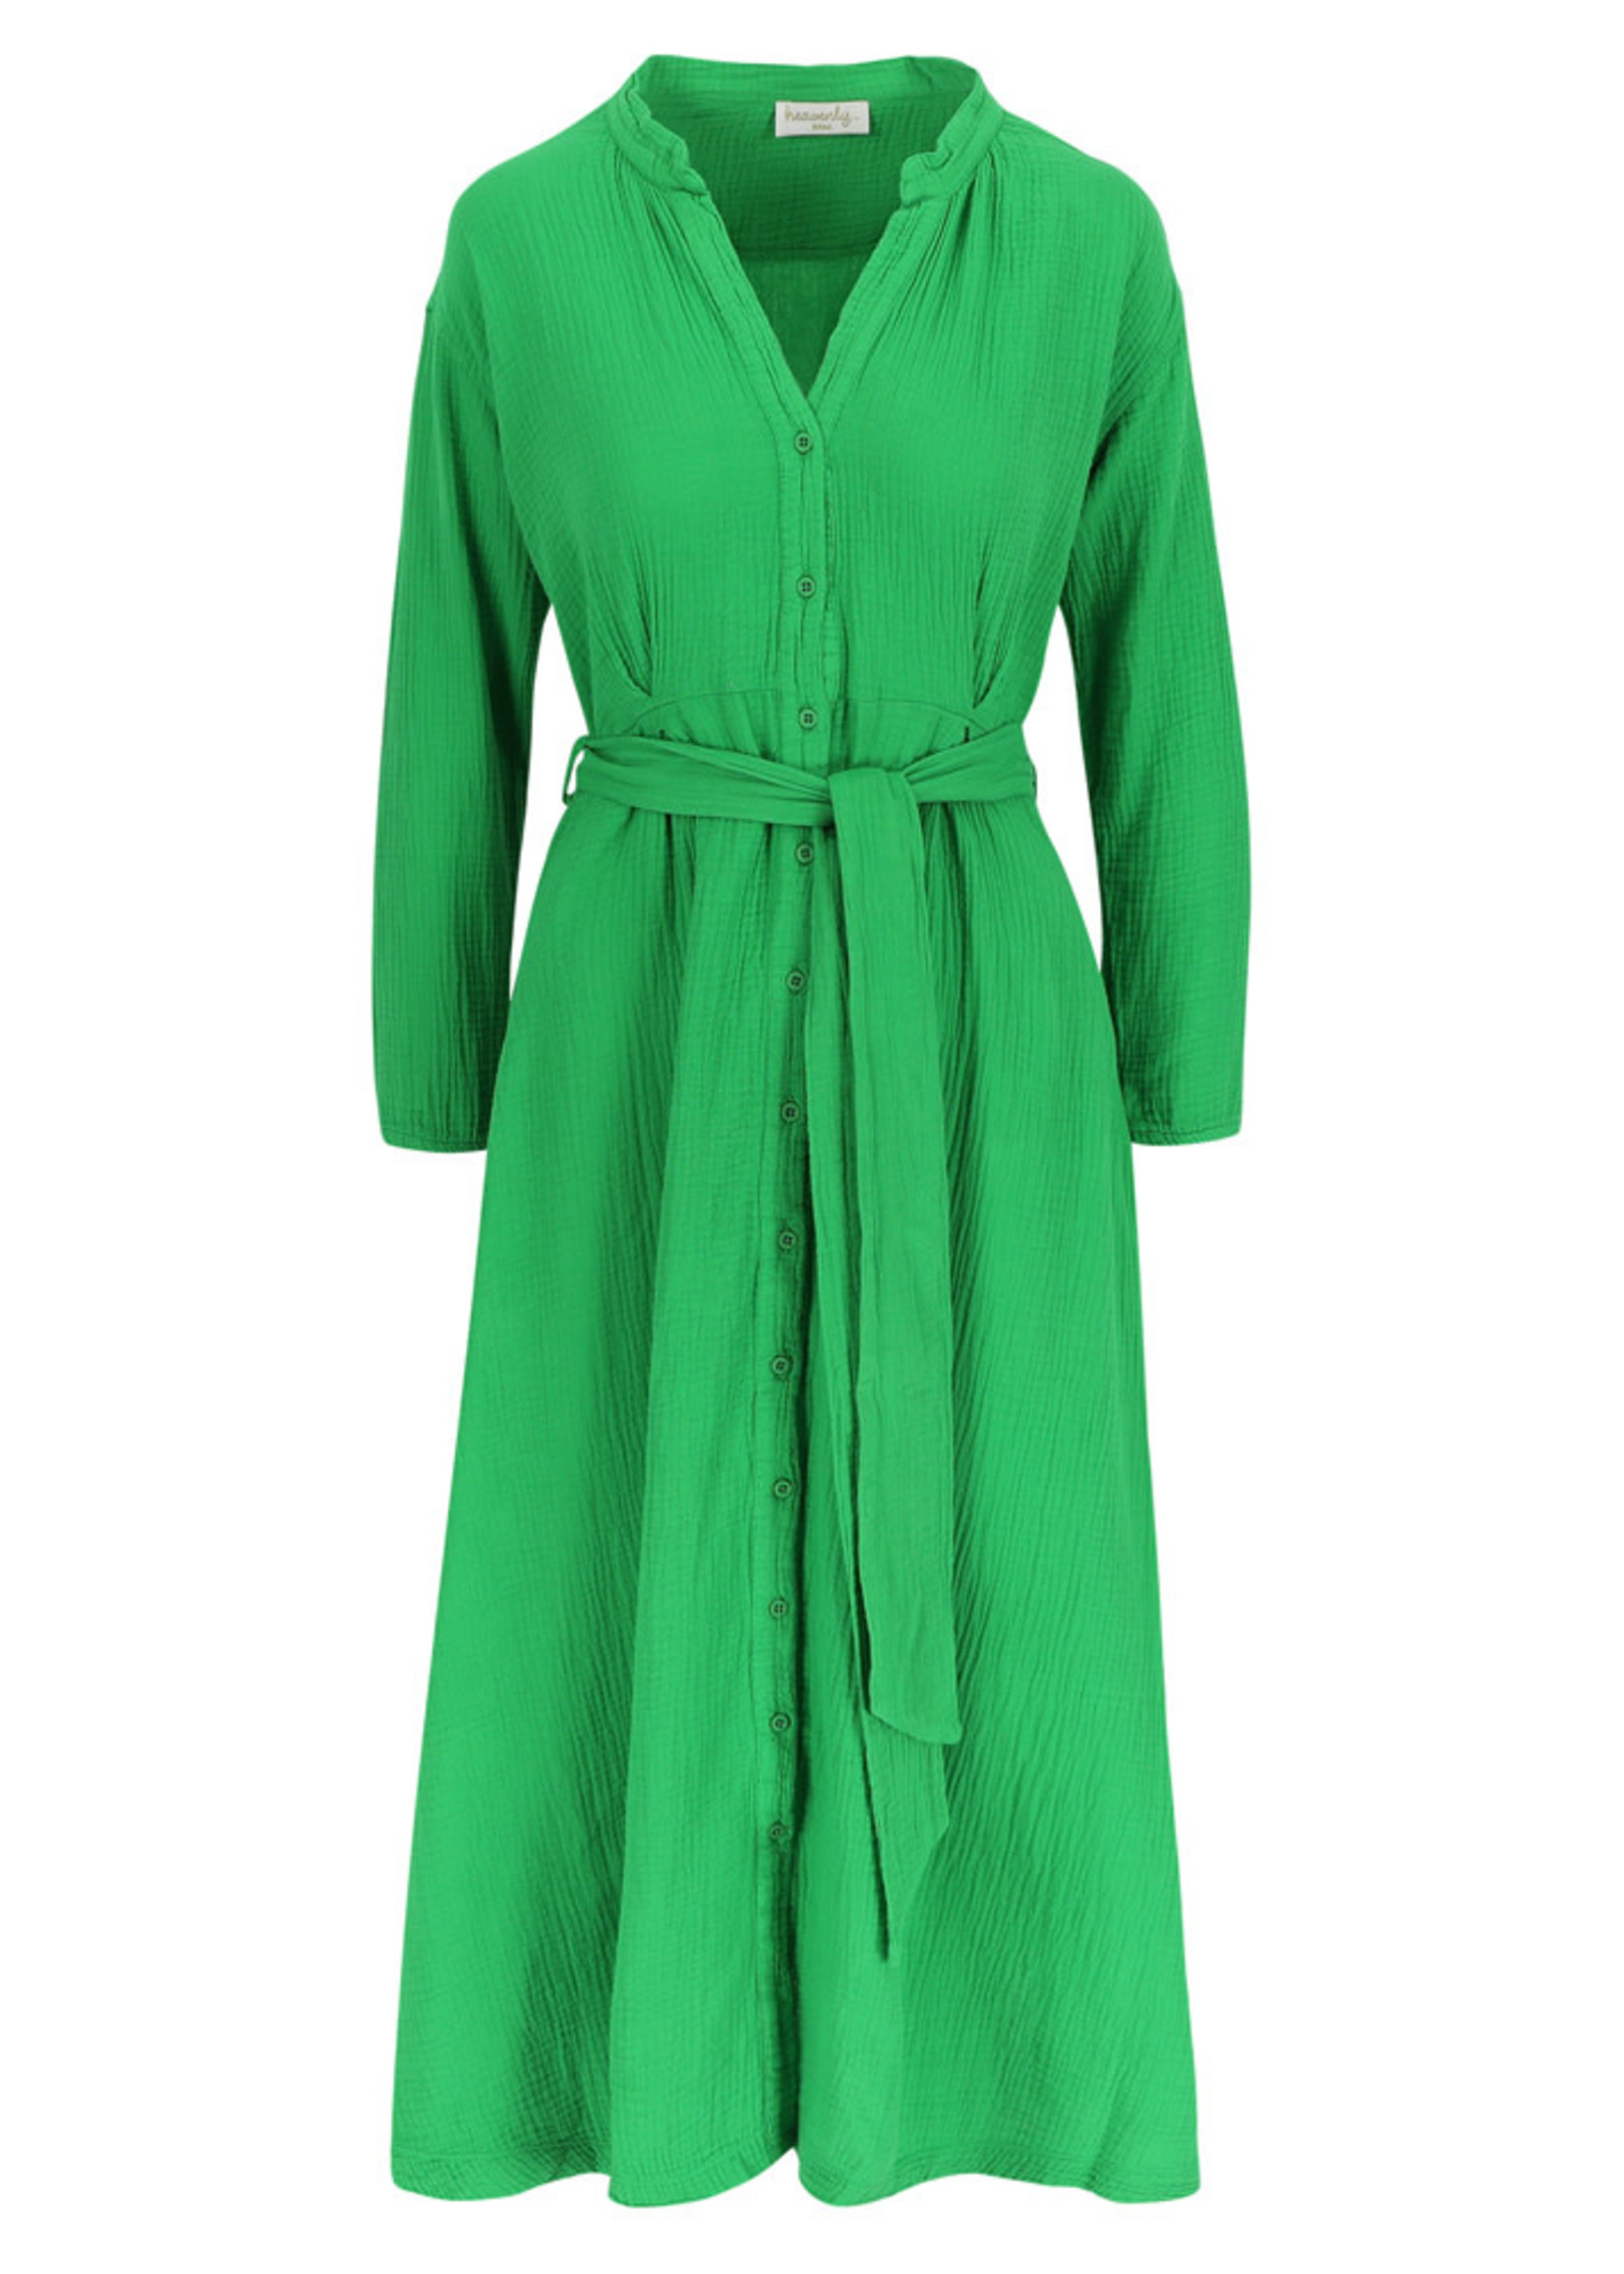 Heavenly Danni Dress - Apple Green